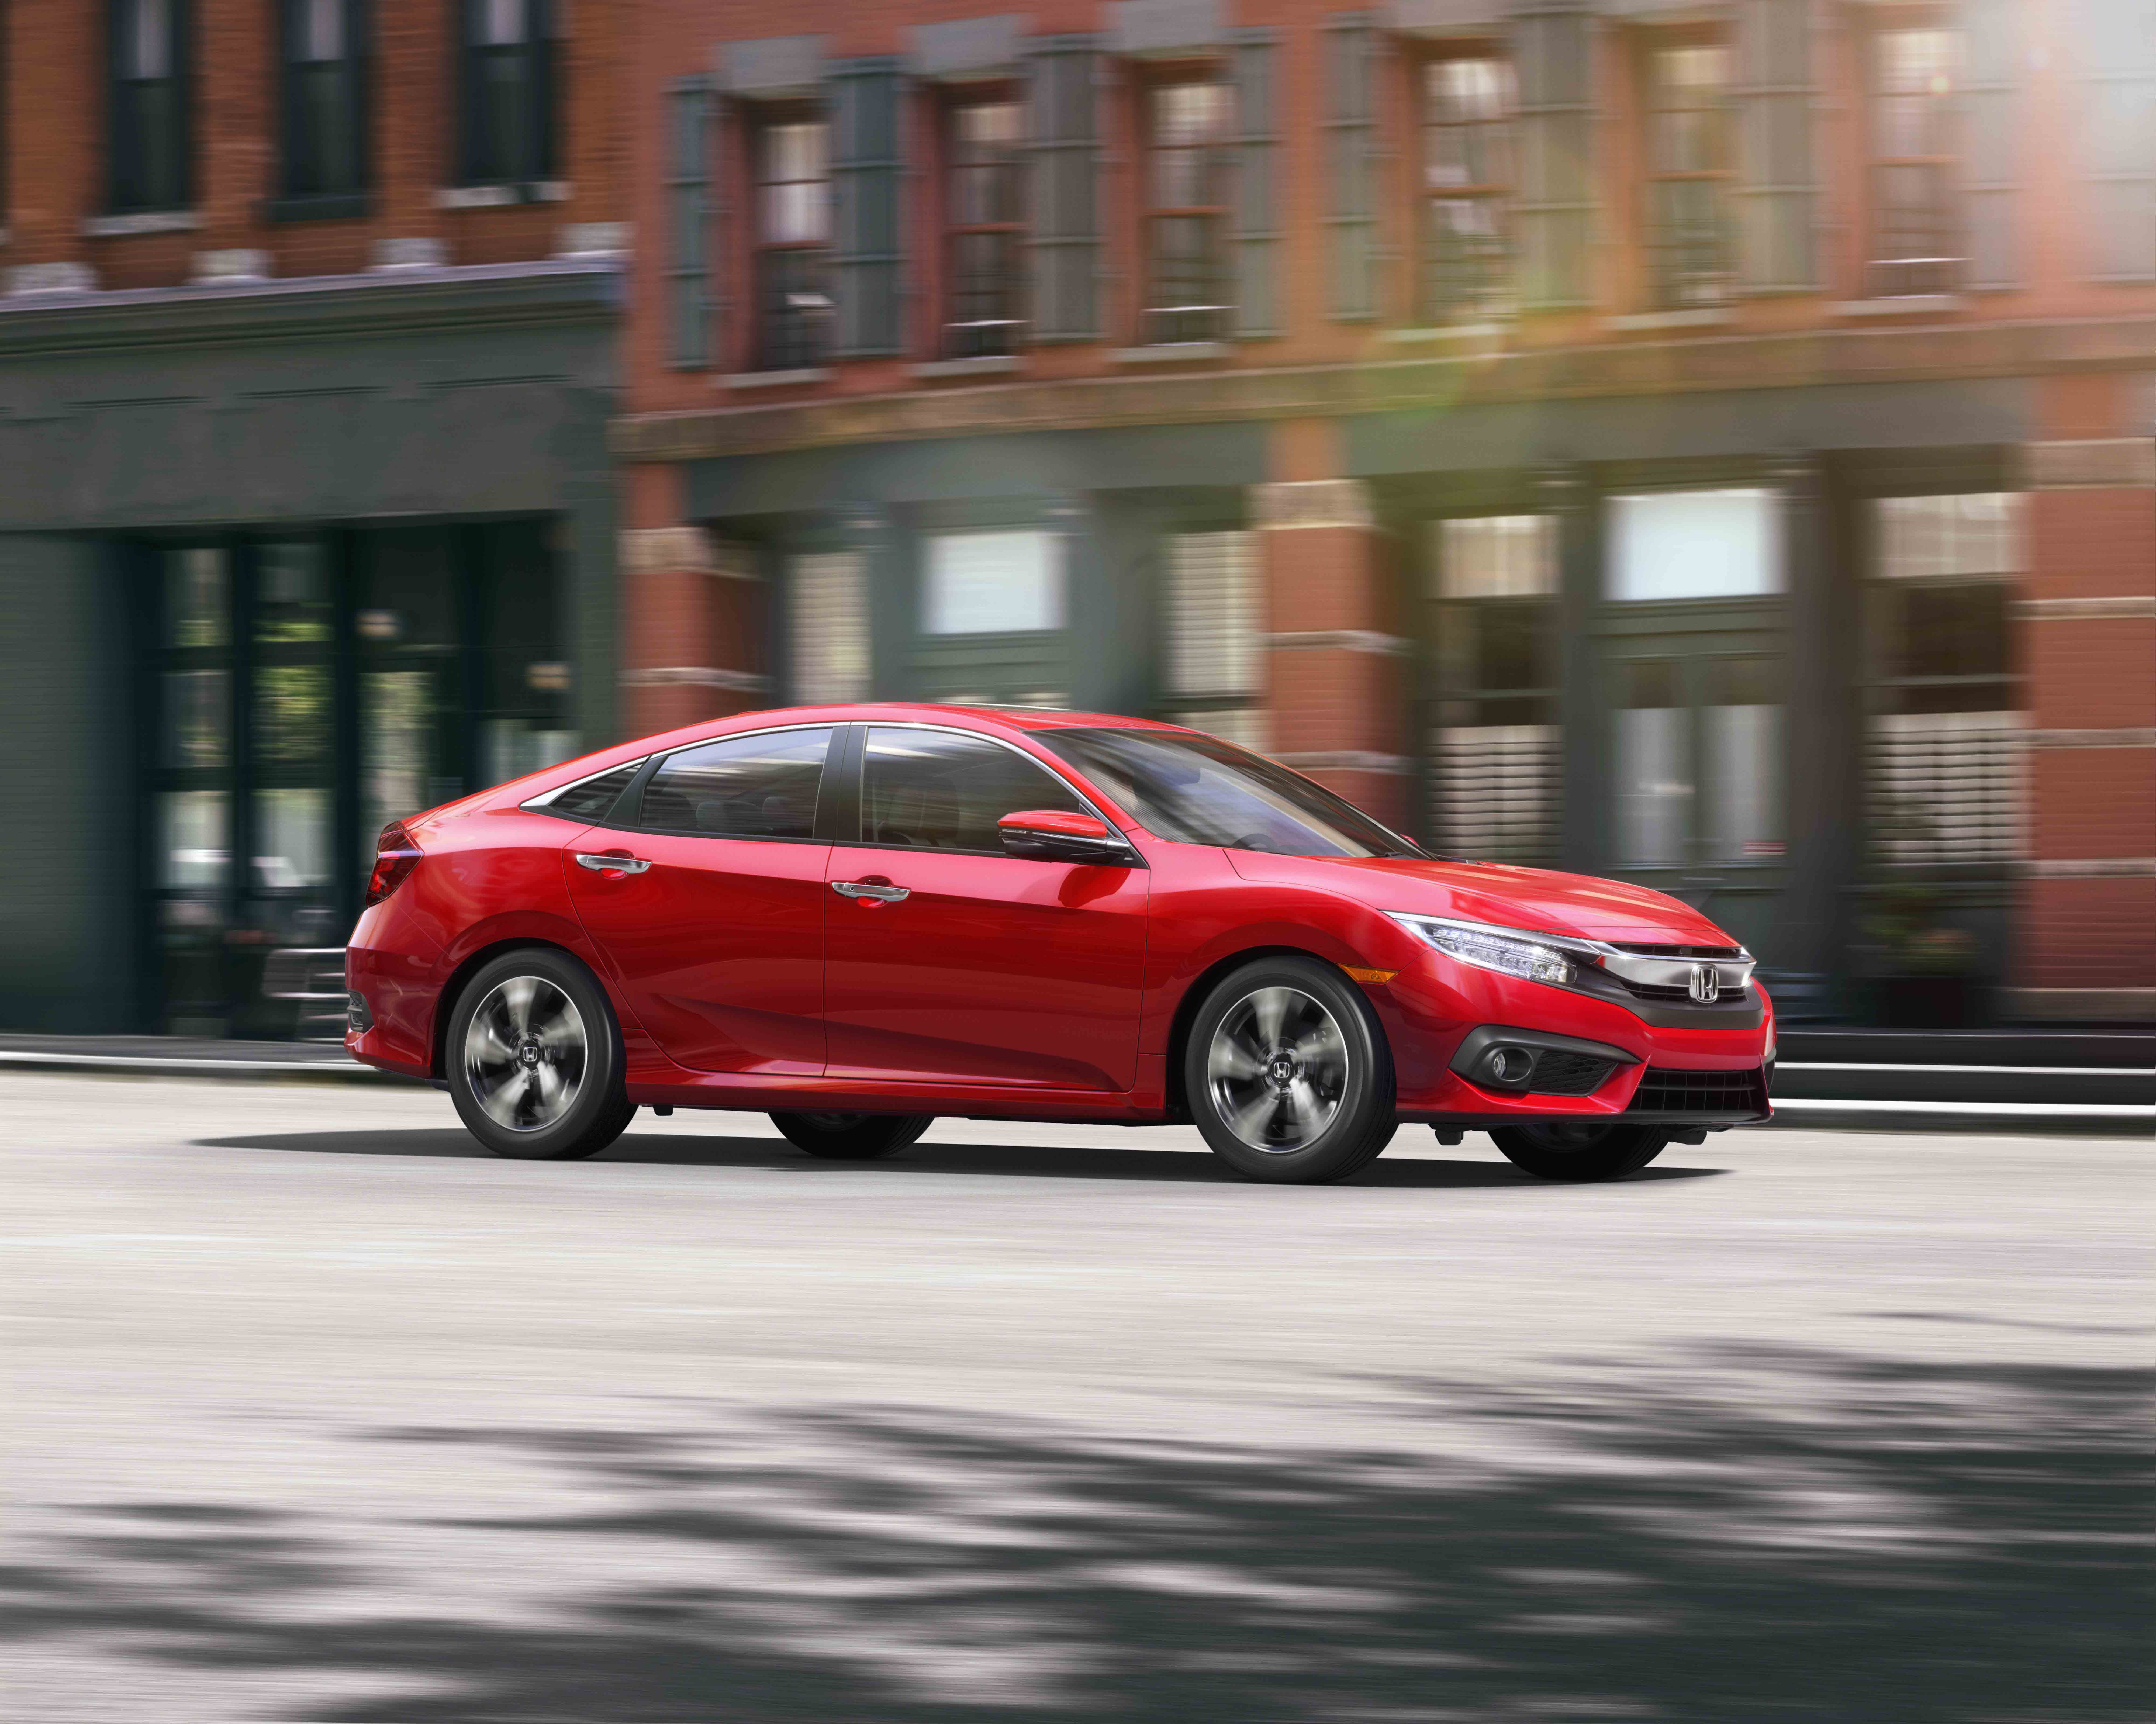 Hondas available in Michigan City at